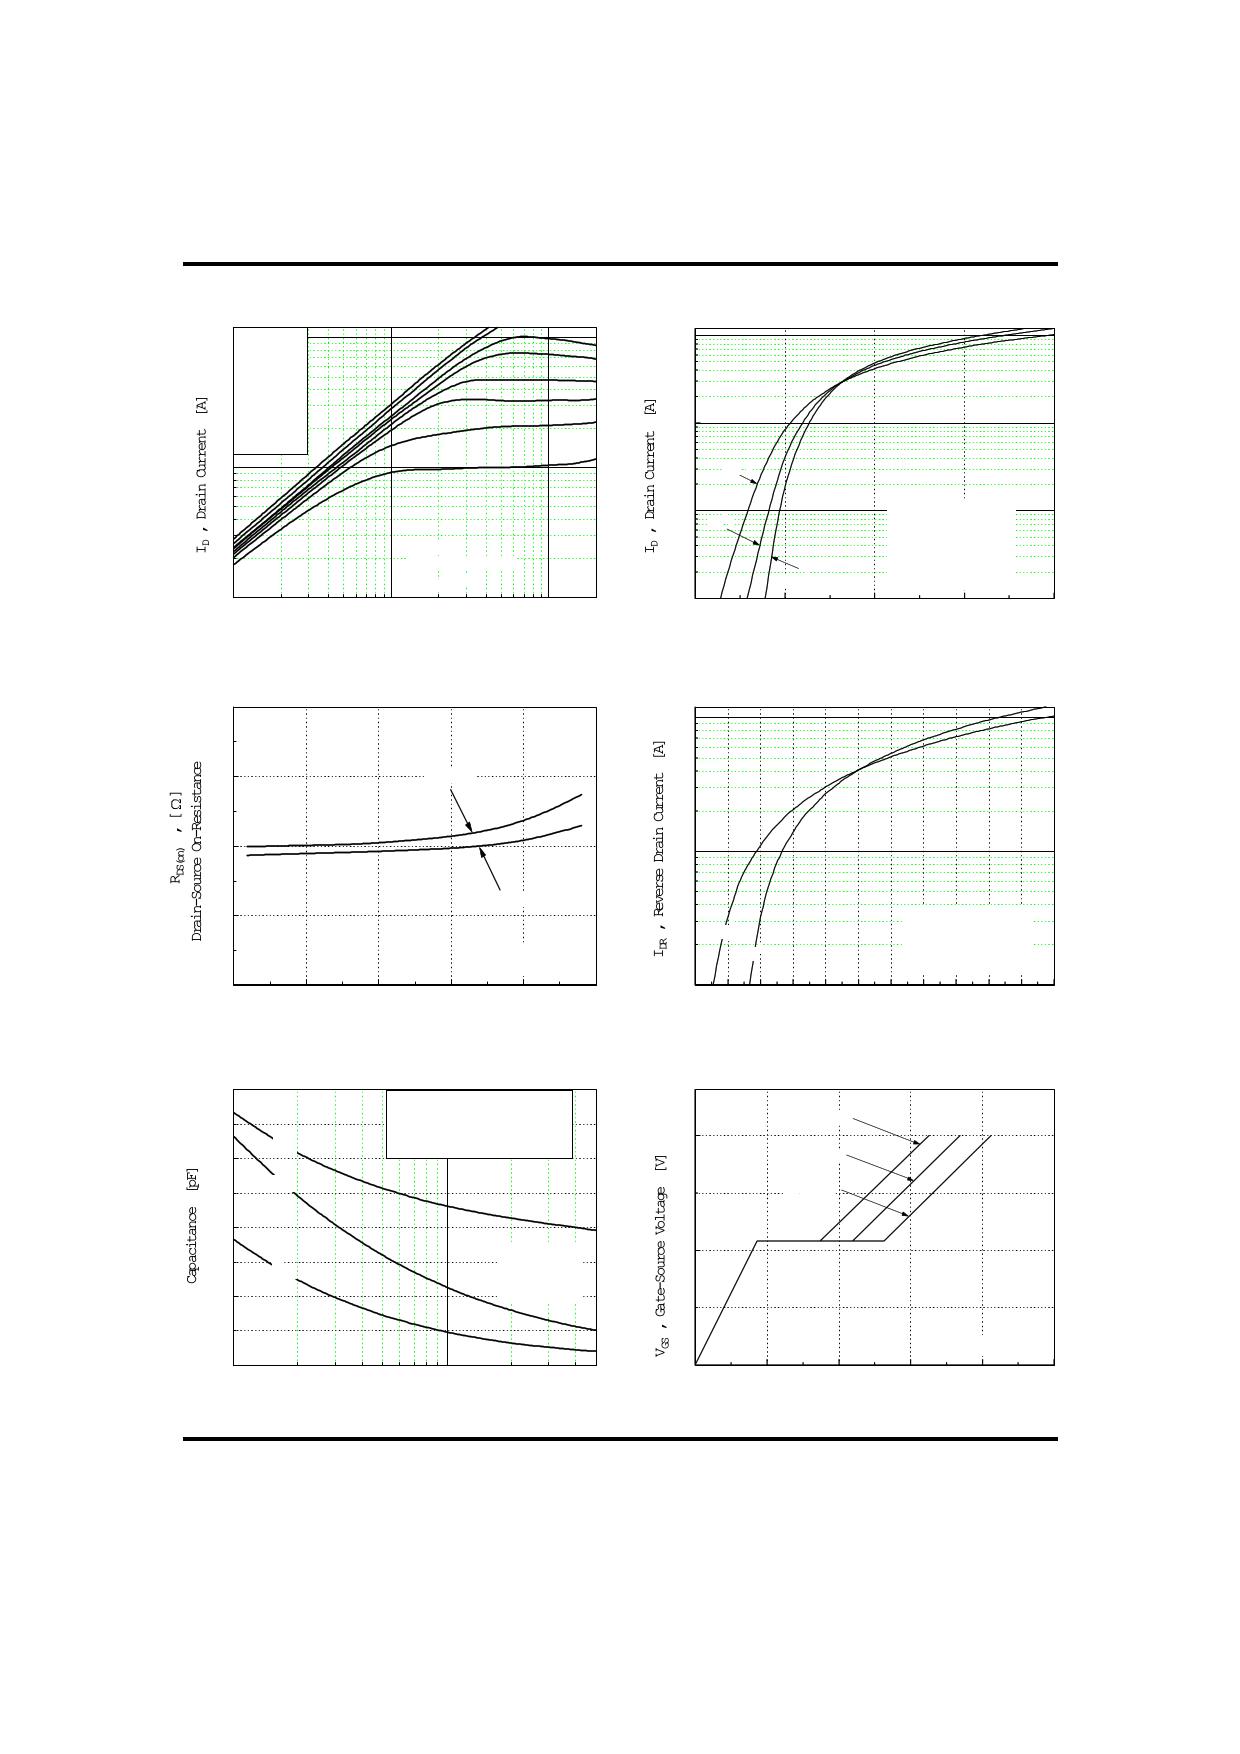 IRFZ34A pdf, ピン配列